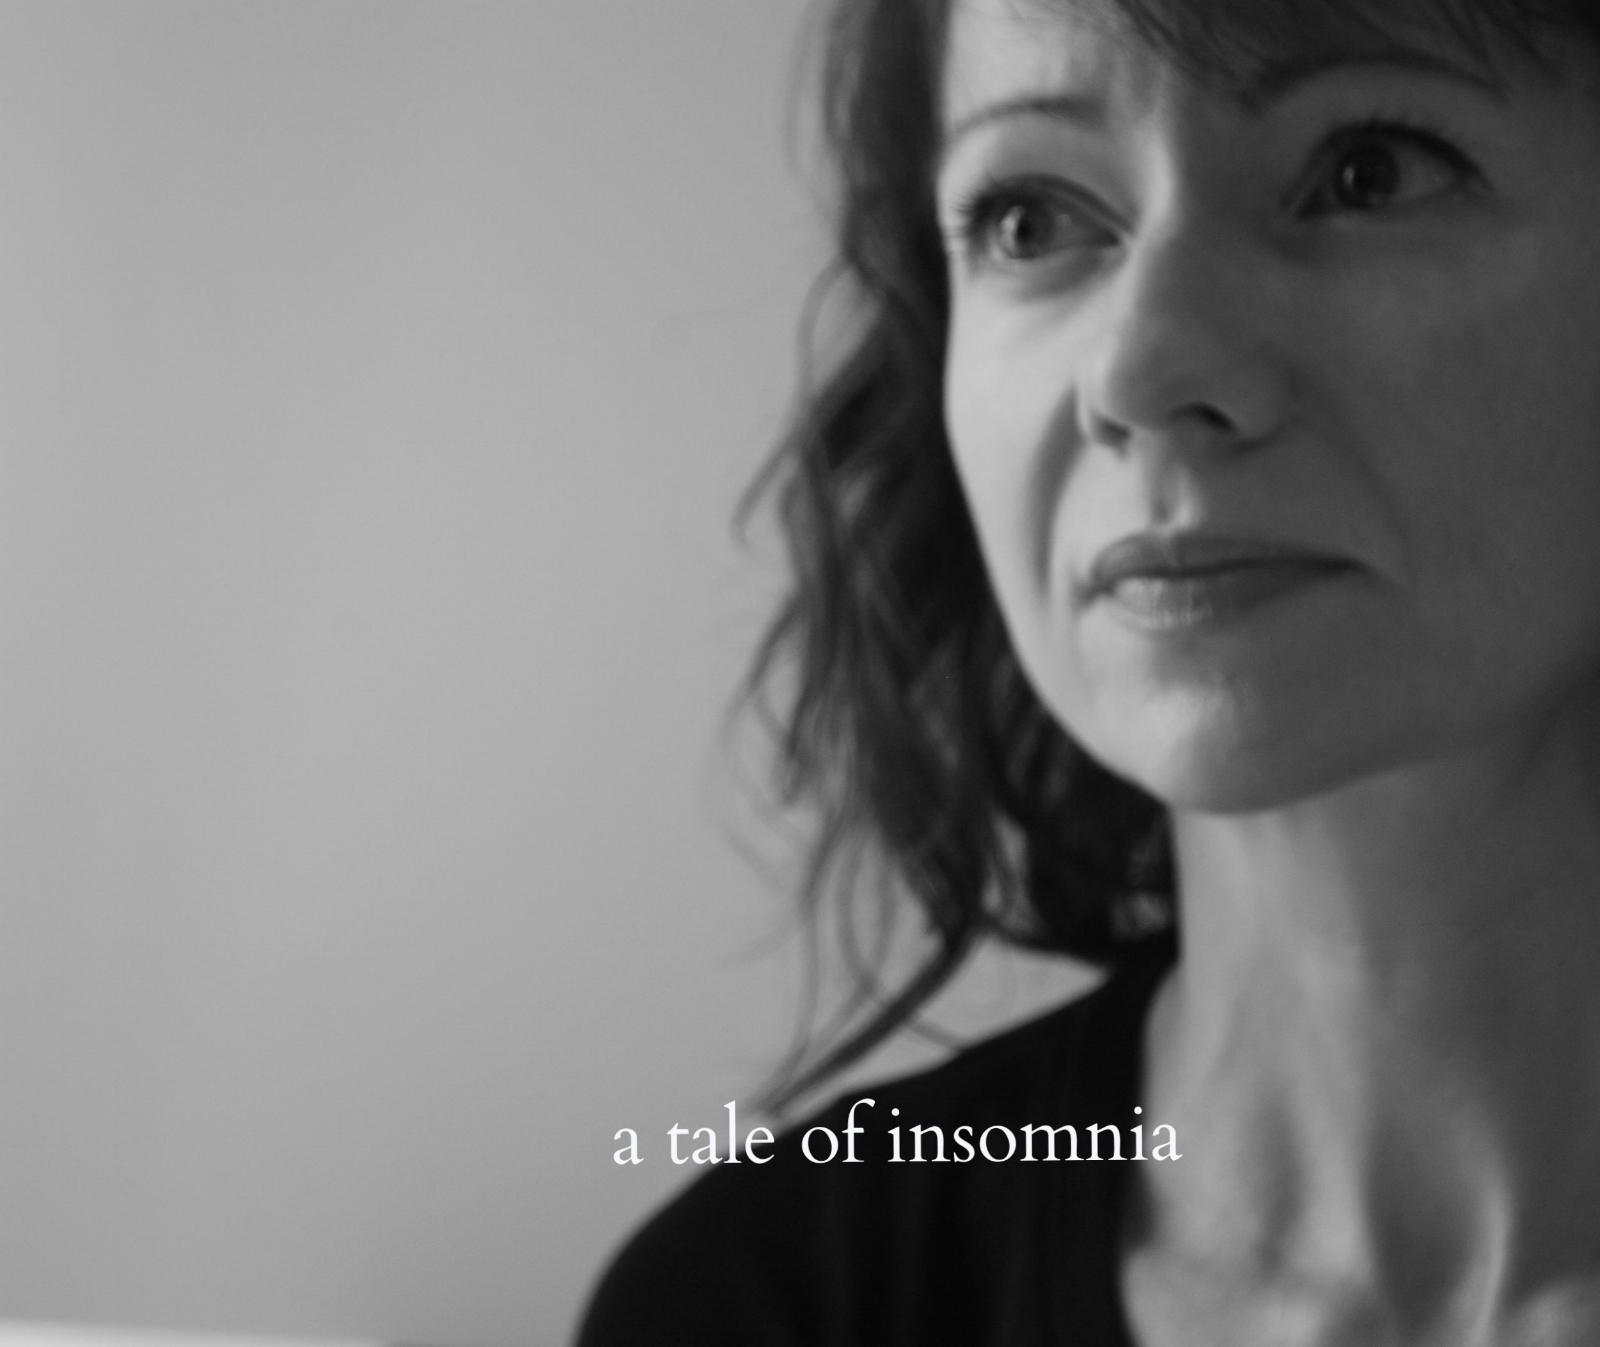 Maria Mutch, know the night